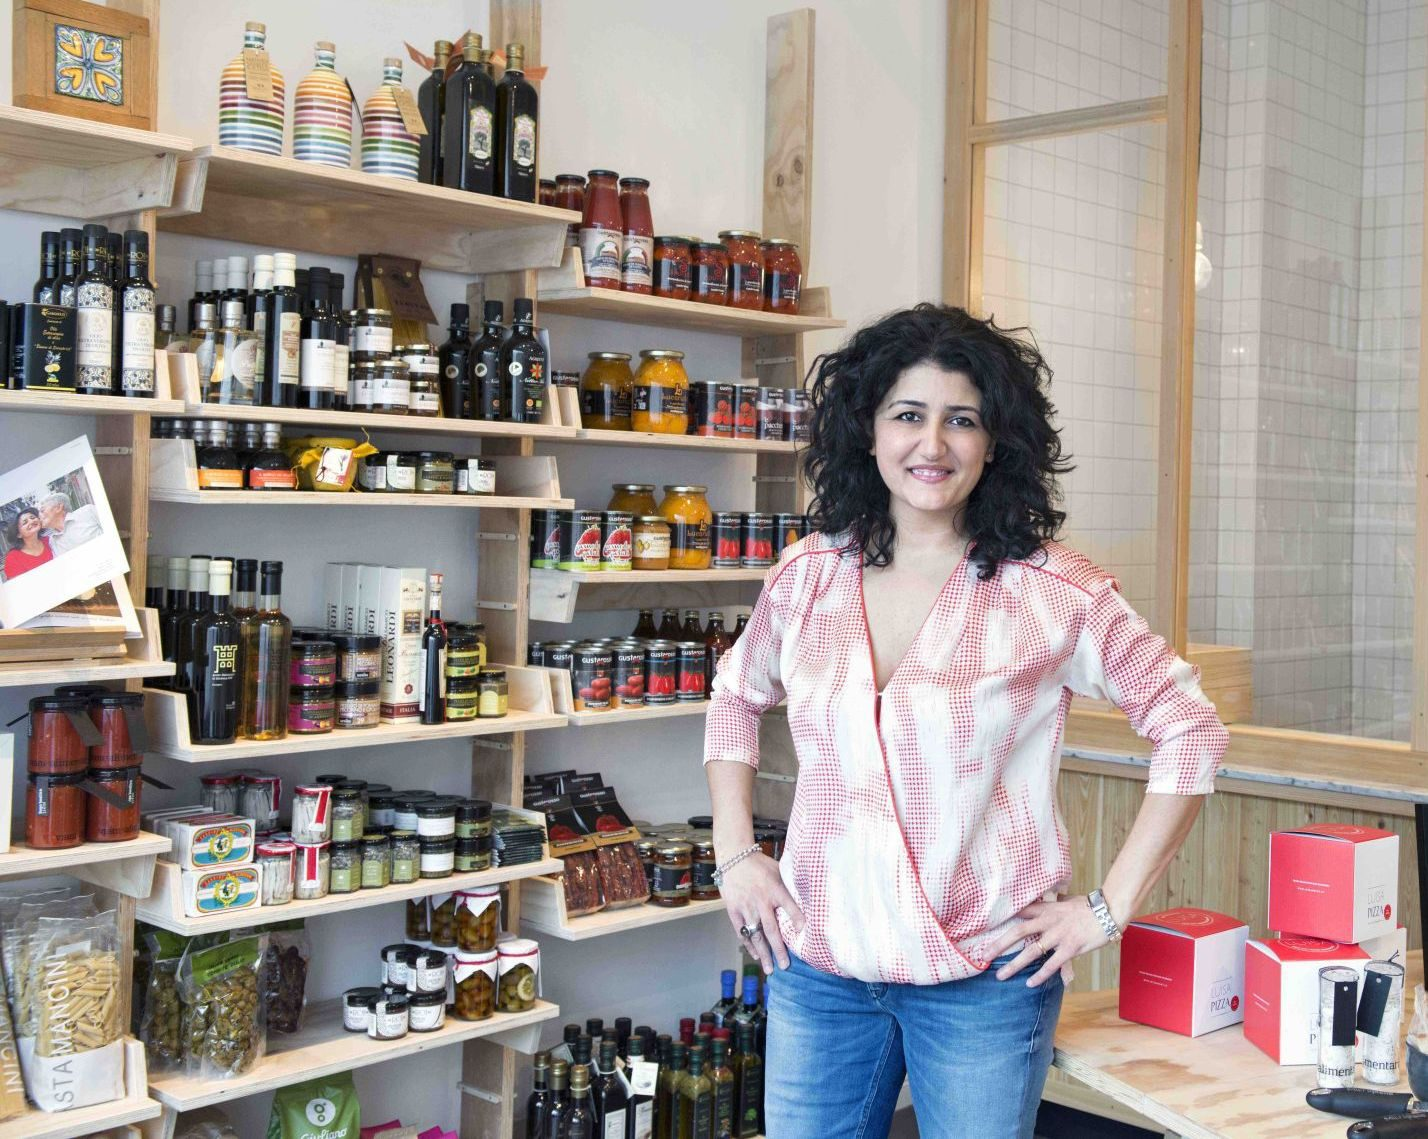 Bringt 100 Prozent Neapel in den Kiez: Luisa Giannitti, besser bekannt als LuisaKocht.